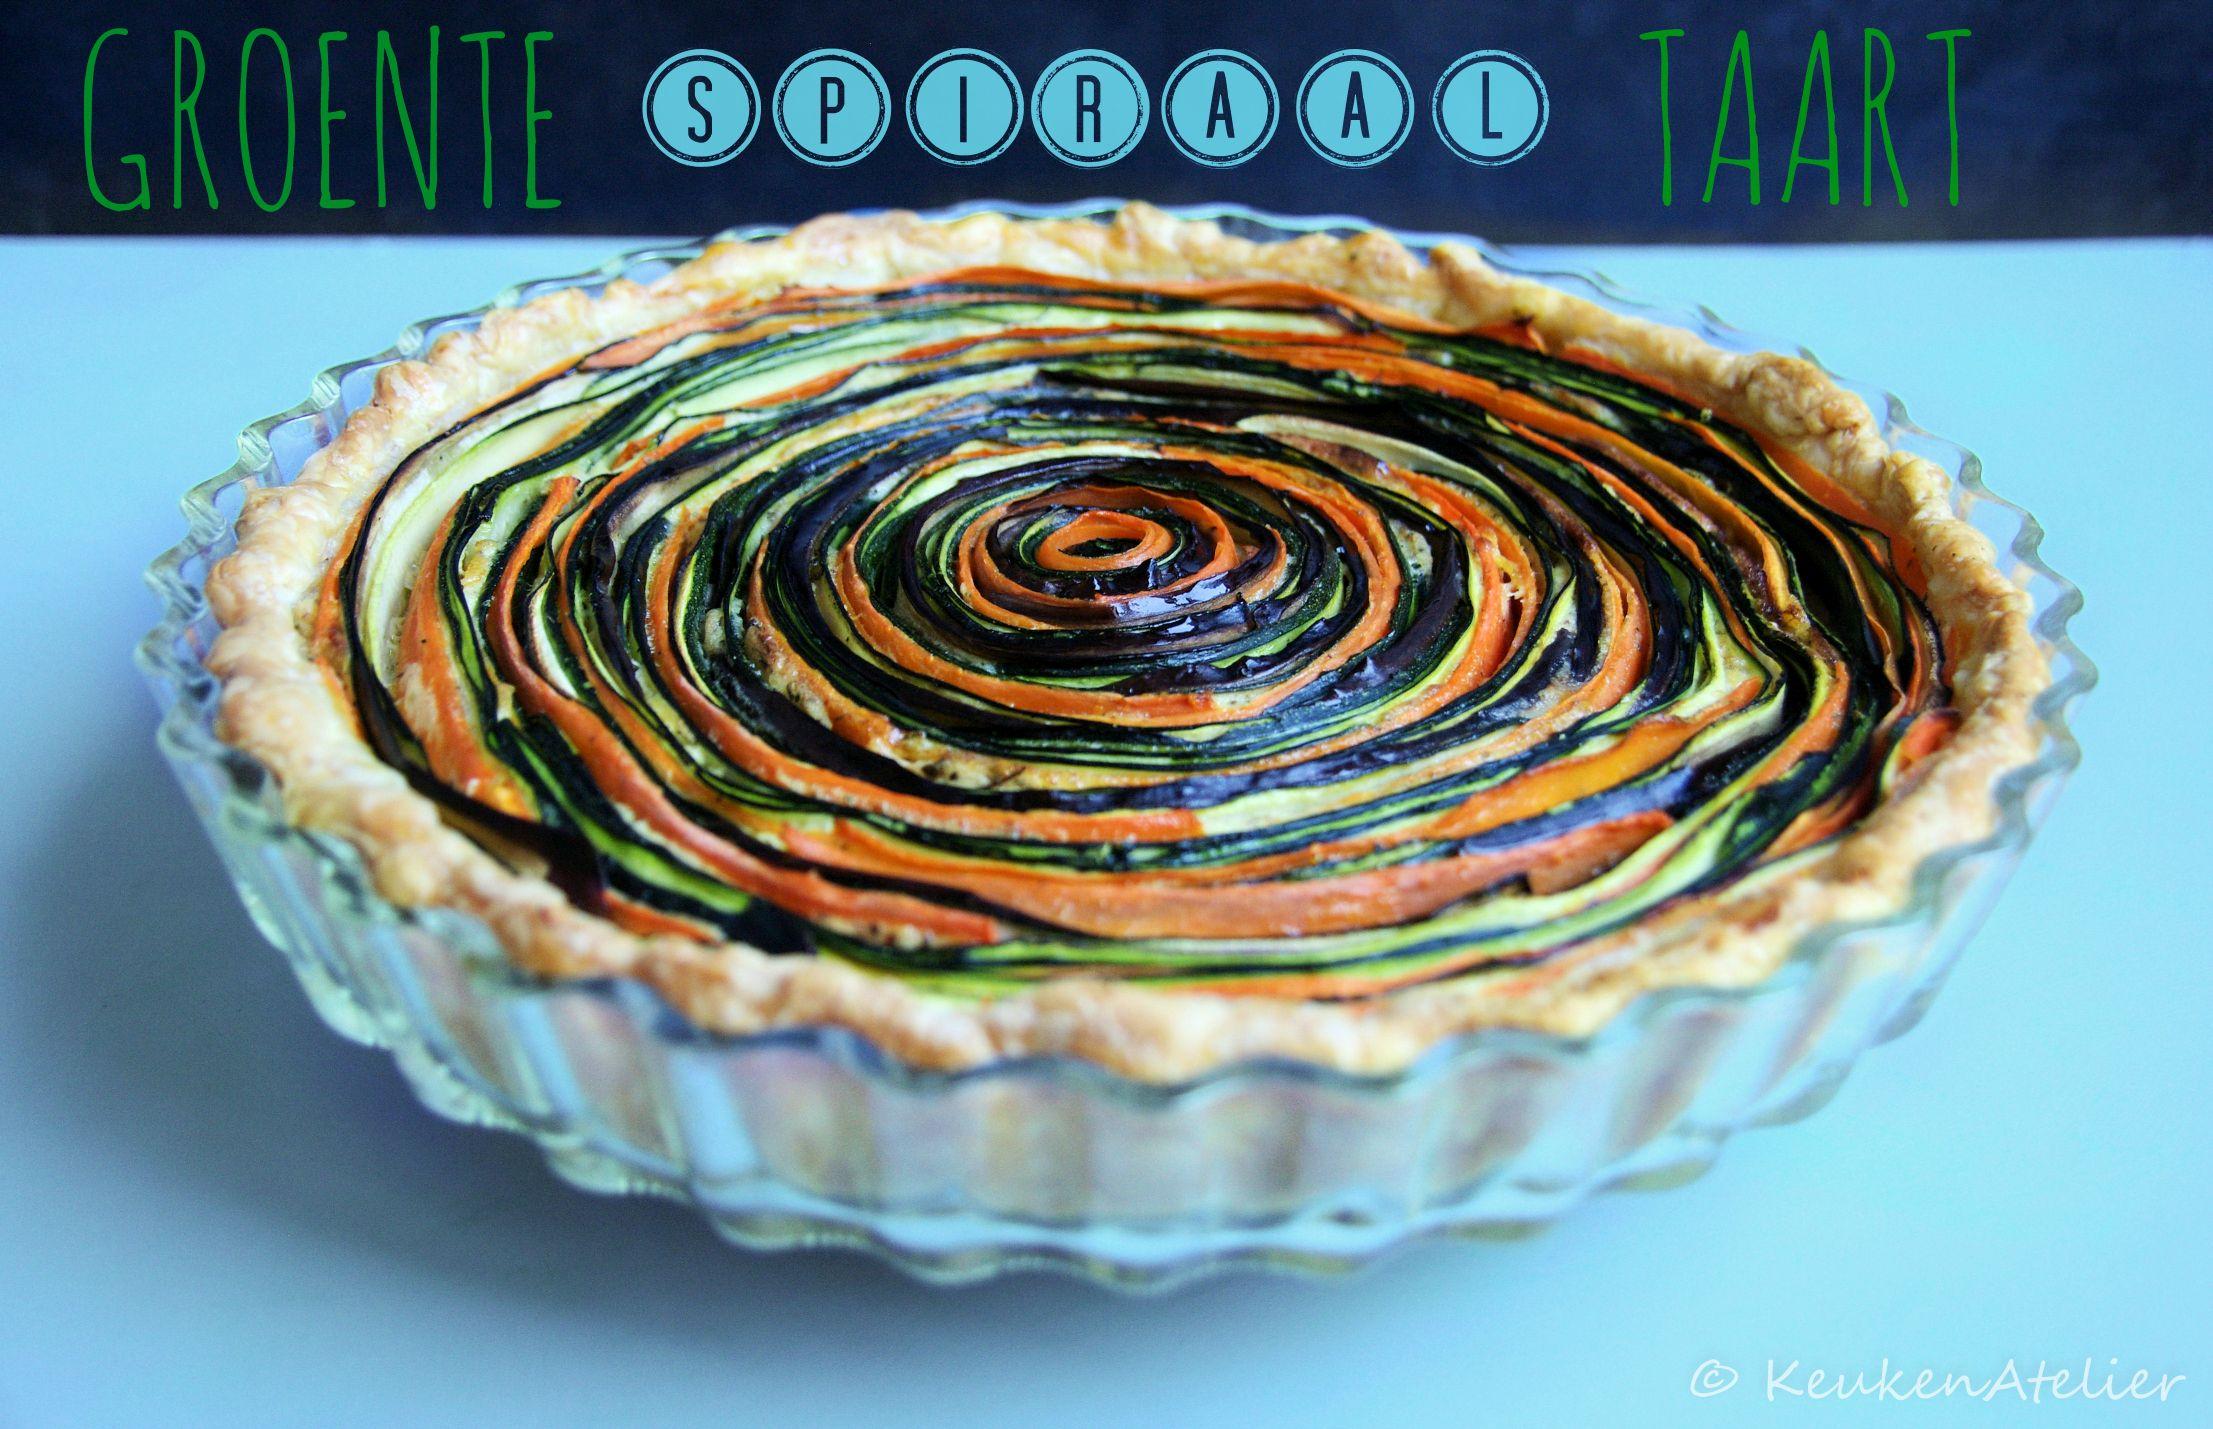 groente spiraal taart 1